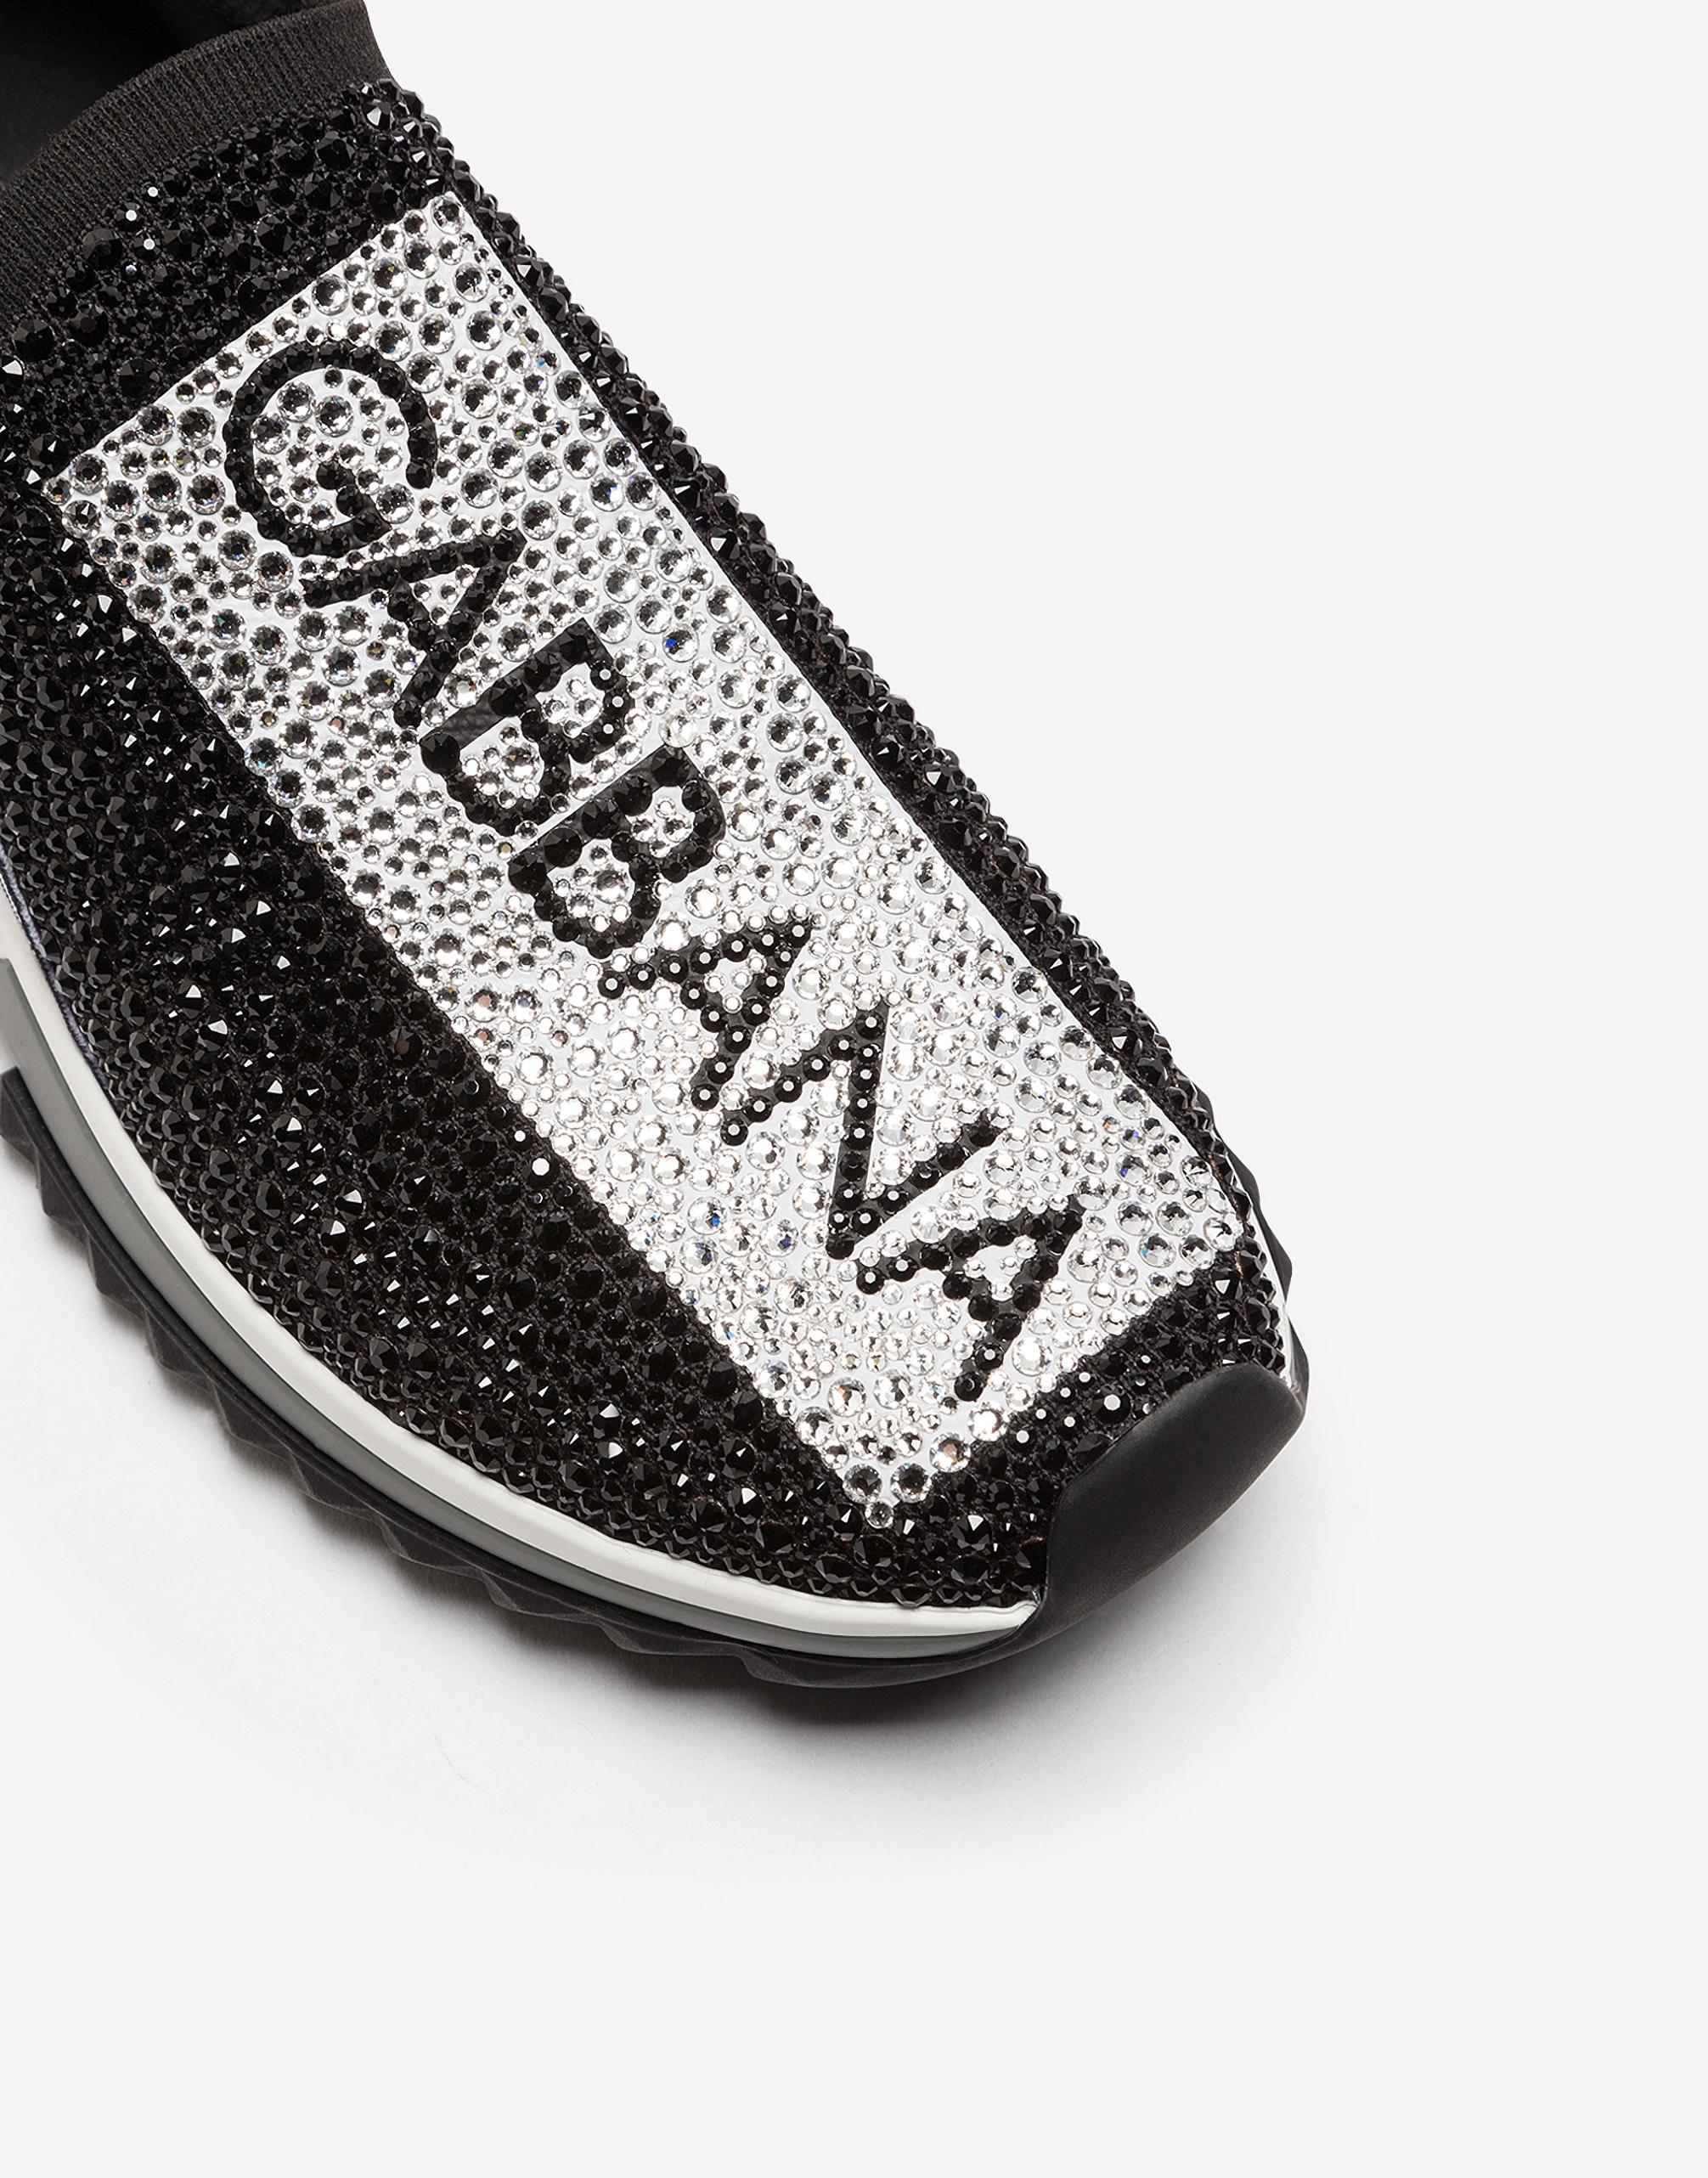 Dolce & Gabbana SORRENTO SNEAKERS WITH RHINESTONES